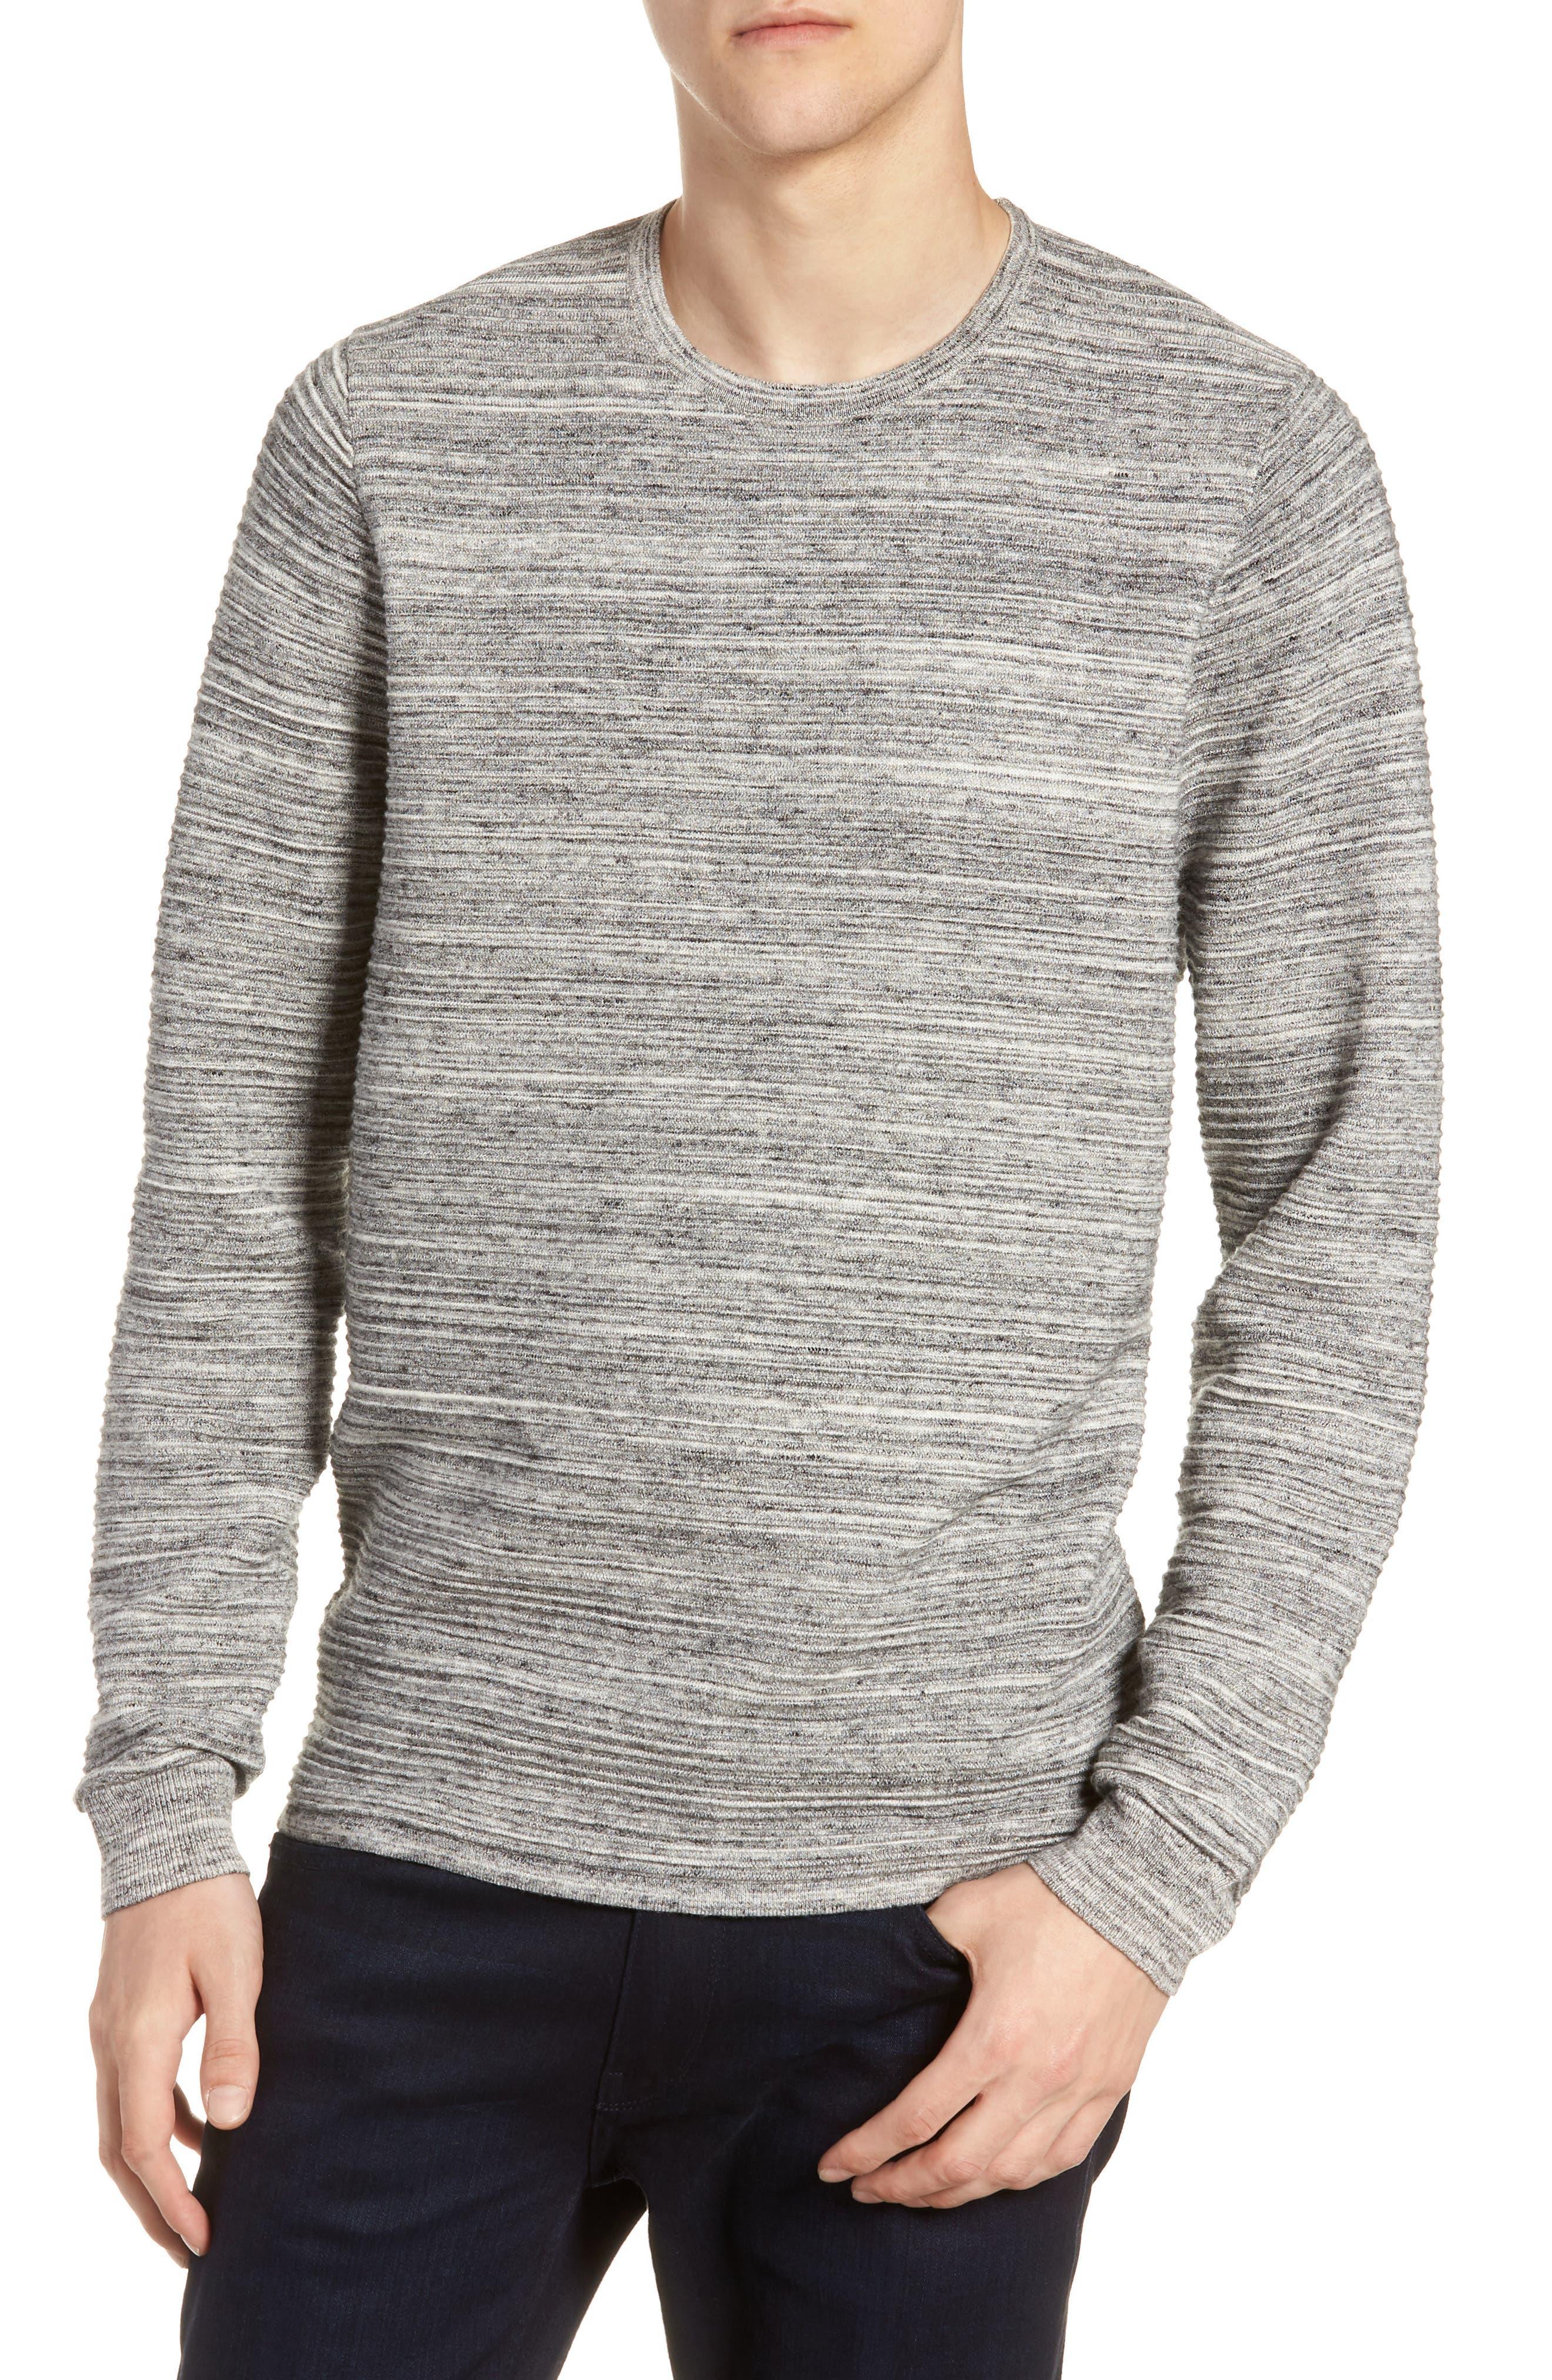 Ottoman Crewneck Sweater,                             Main thumbnail 1, color,                             GREY TORNADO SPACEDYE